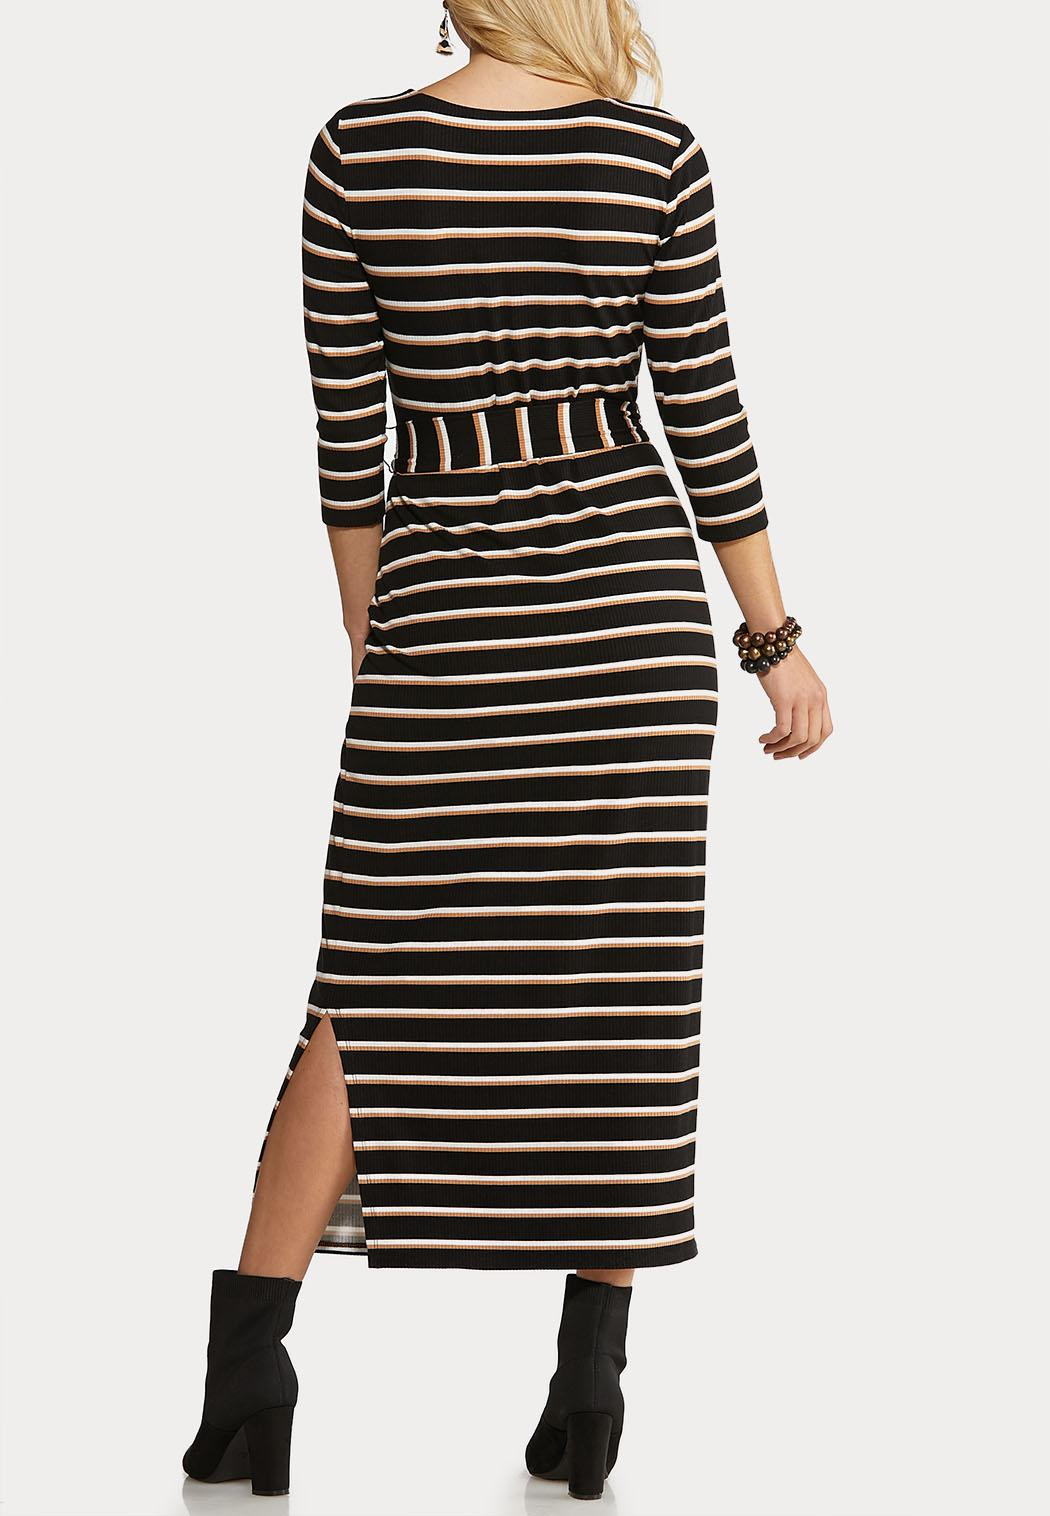 Belted Stripe Knit Dress (Item #44070431)